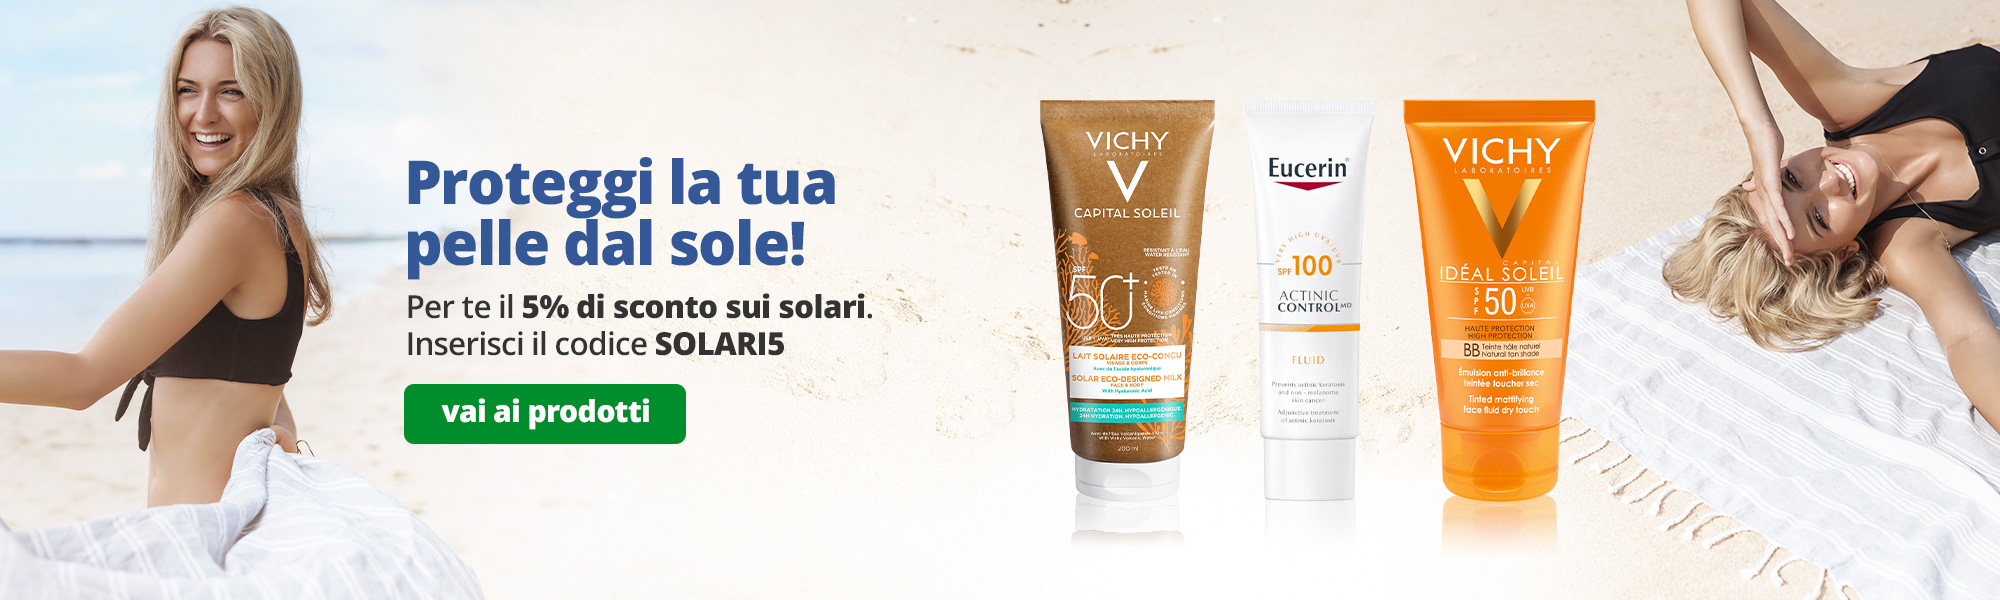 promo solari coupon